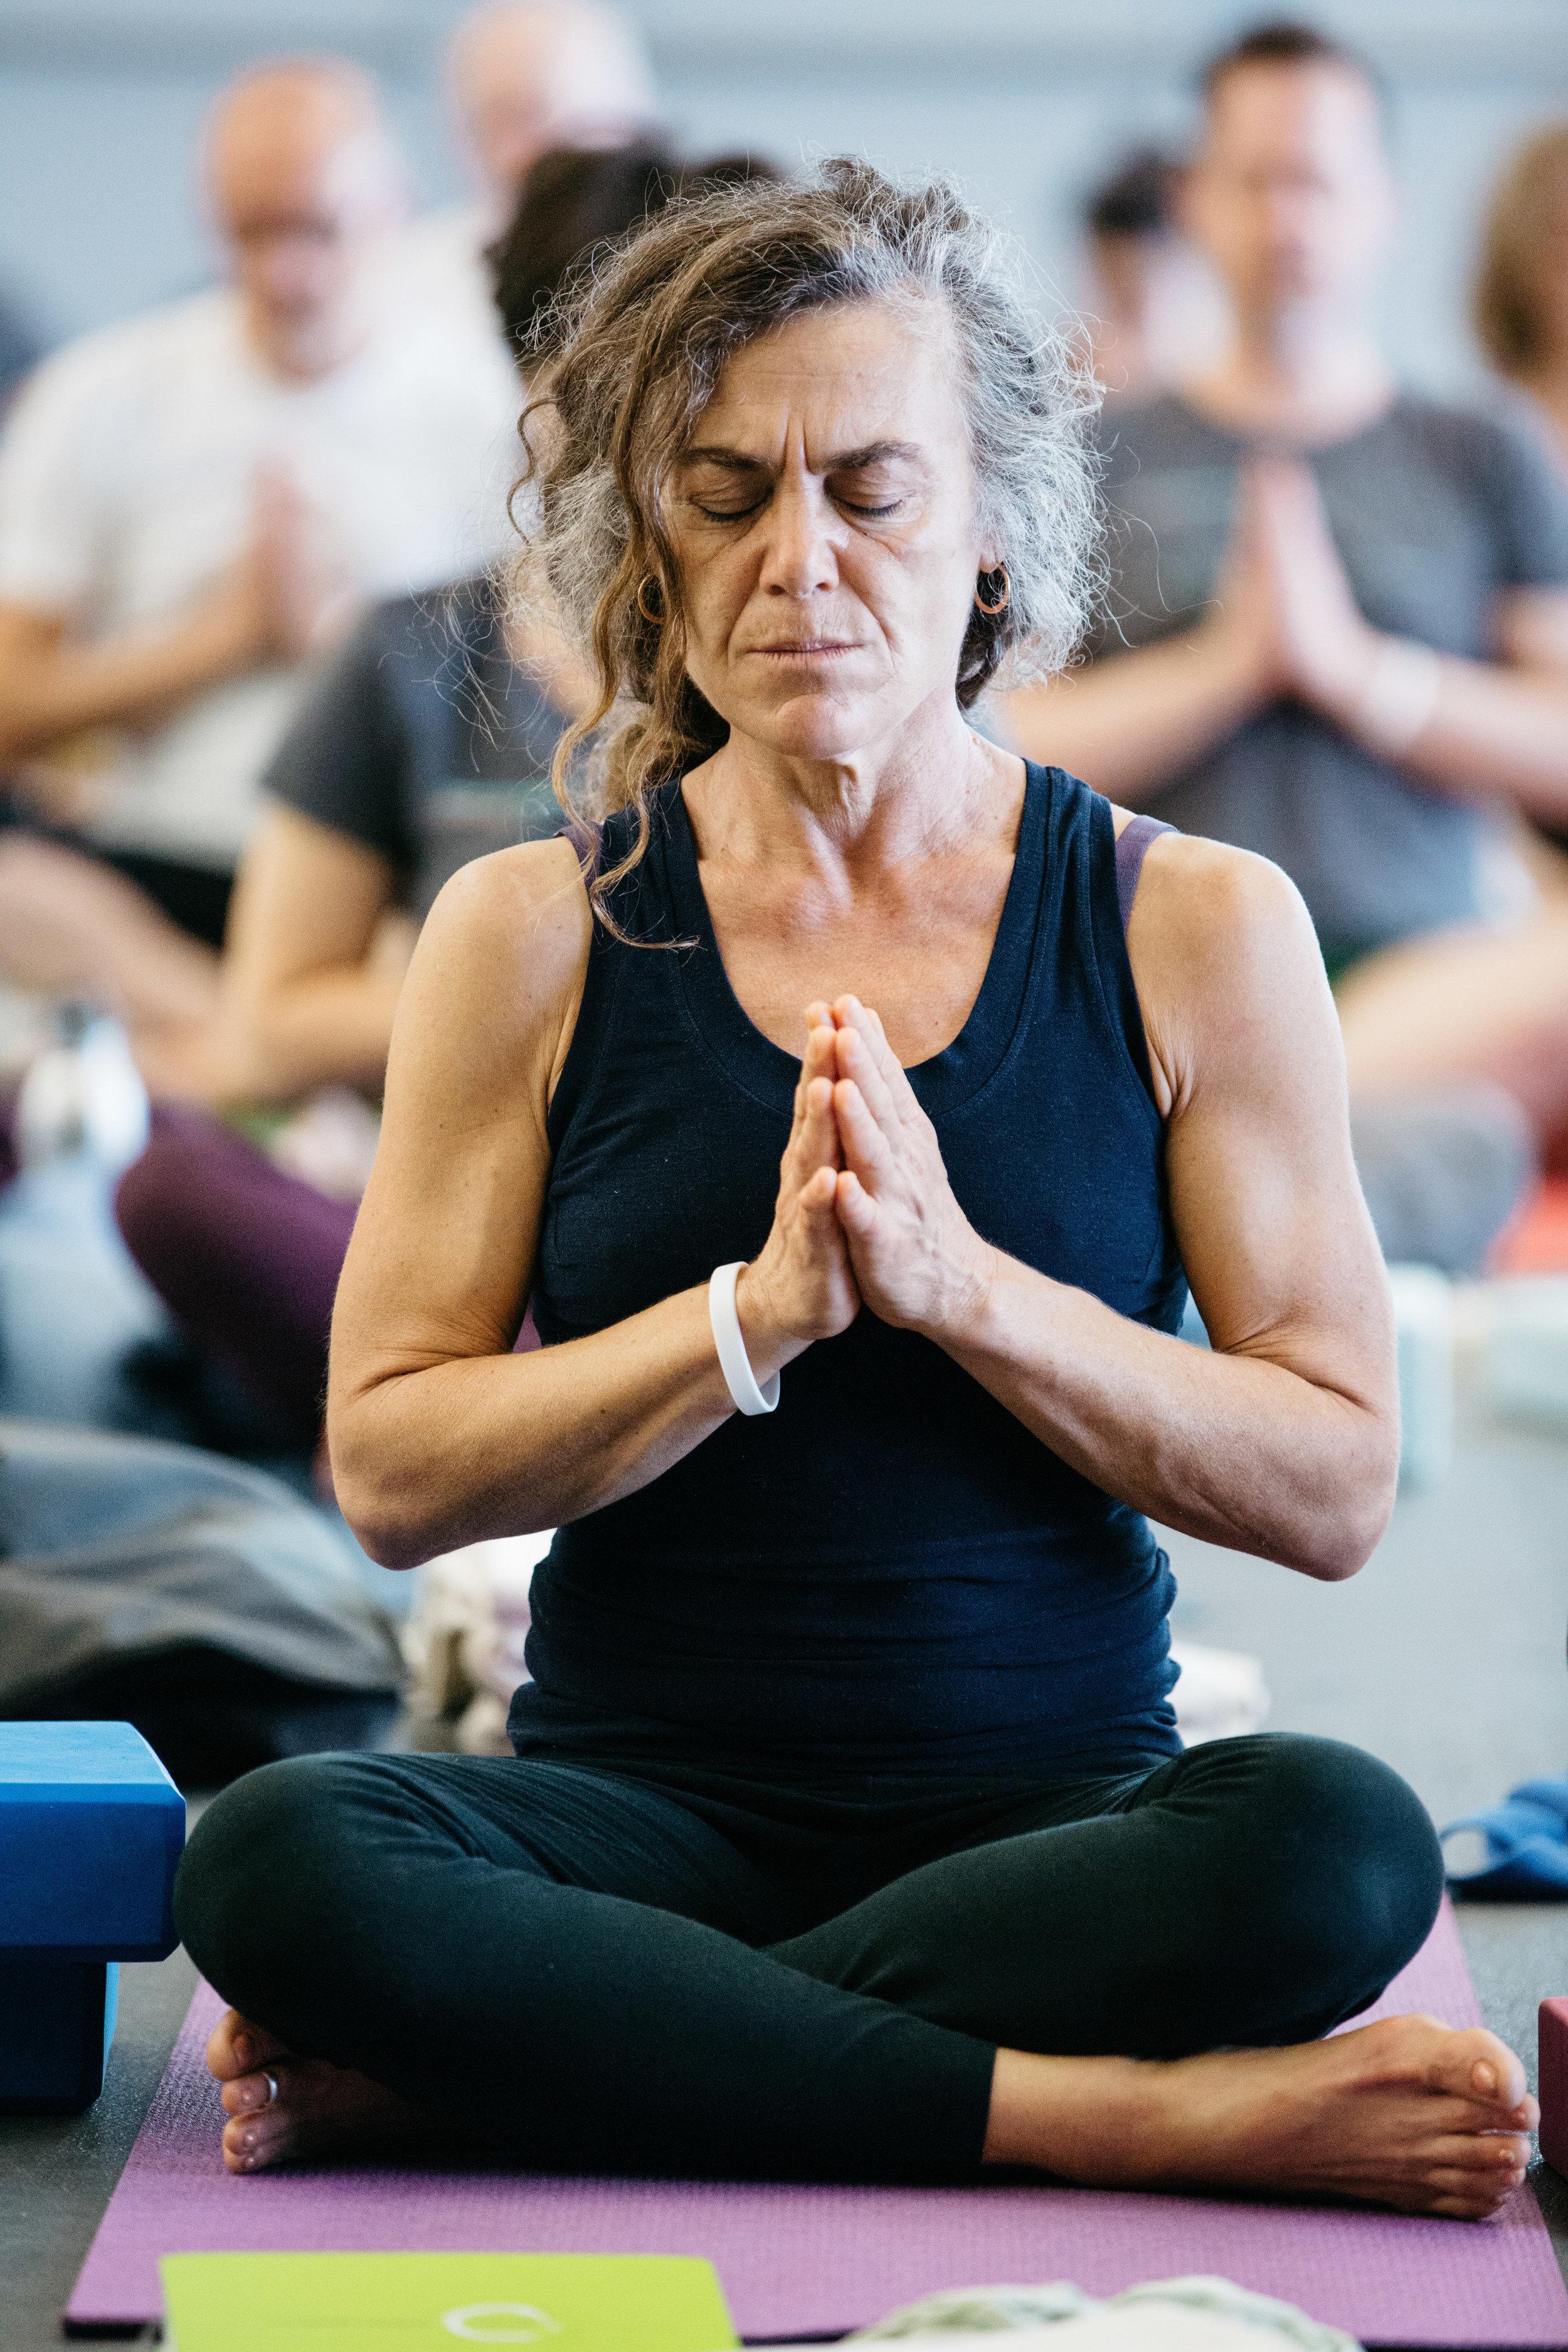 Yoga Convention_21-05-2018-71.jpg